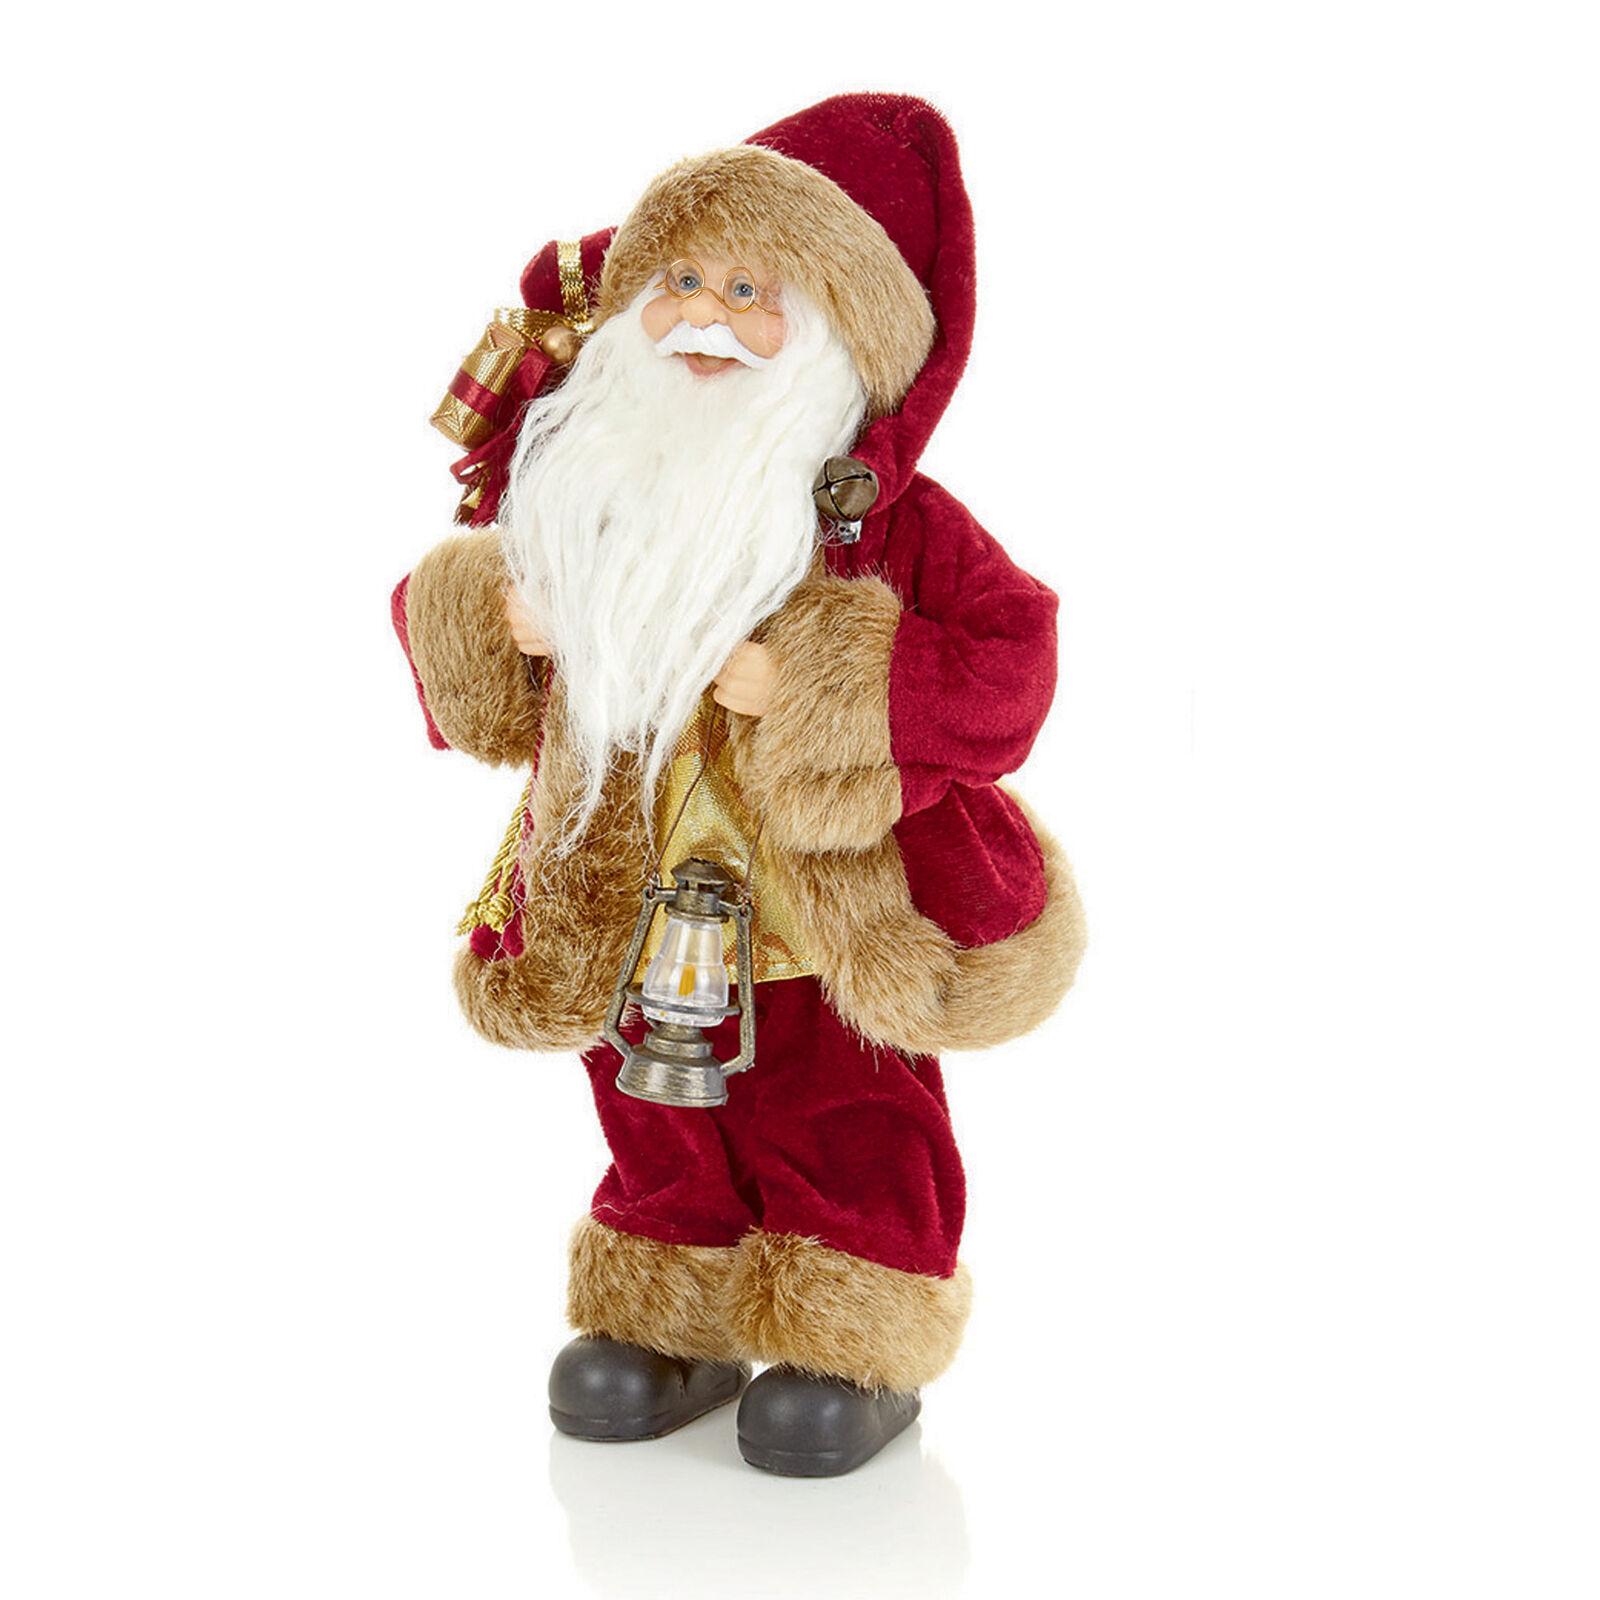 Christmas Room Decoration Burgundy//Gold 30cm-40cm Sitting or Standing Santa